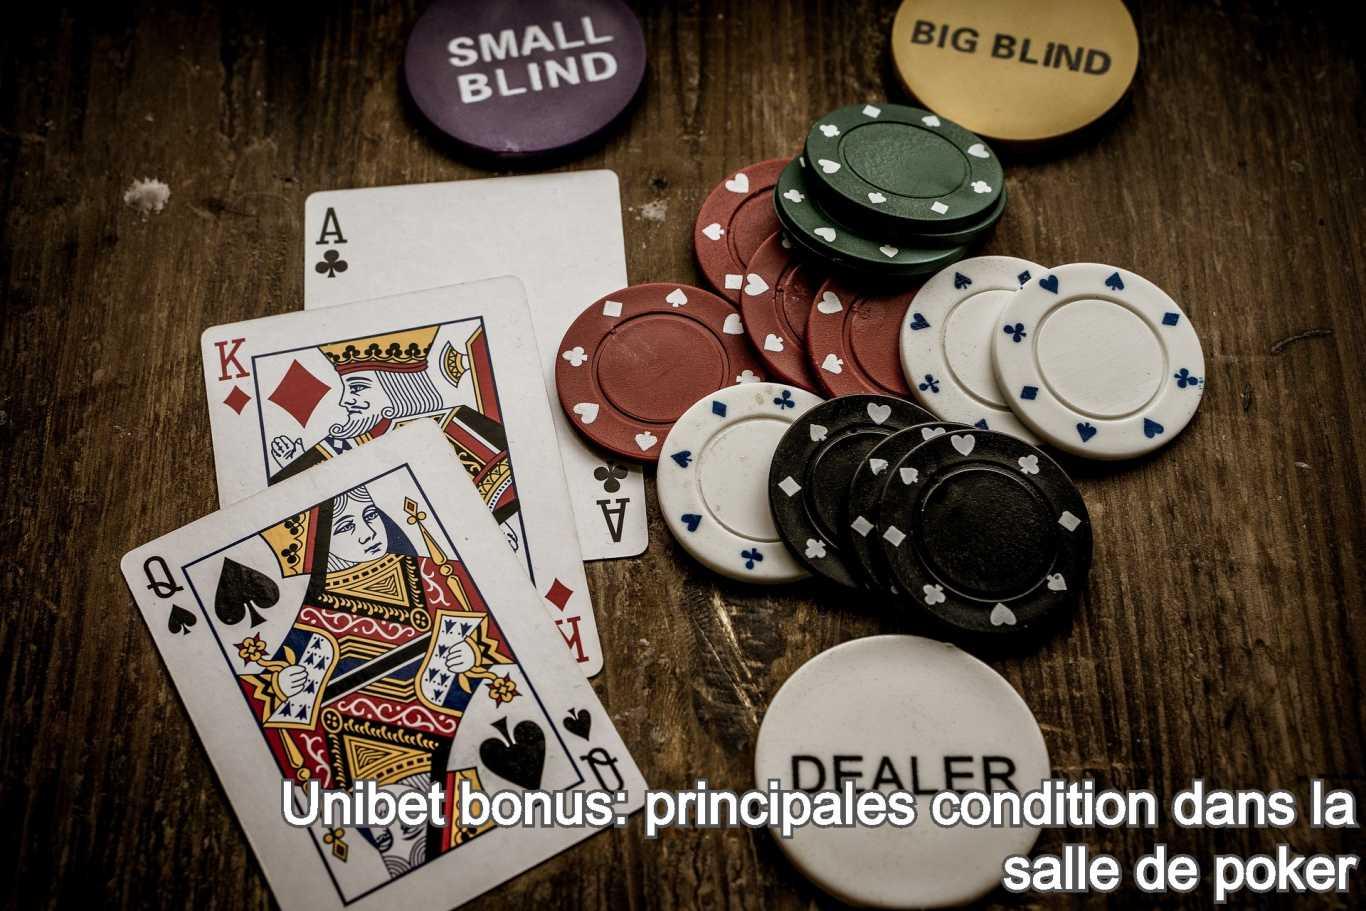 Unibet bonus: principales condition dans la salle de poker